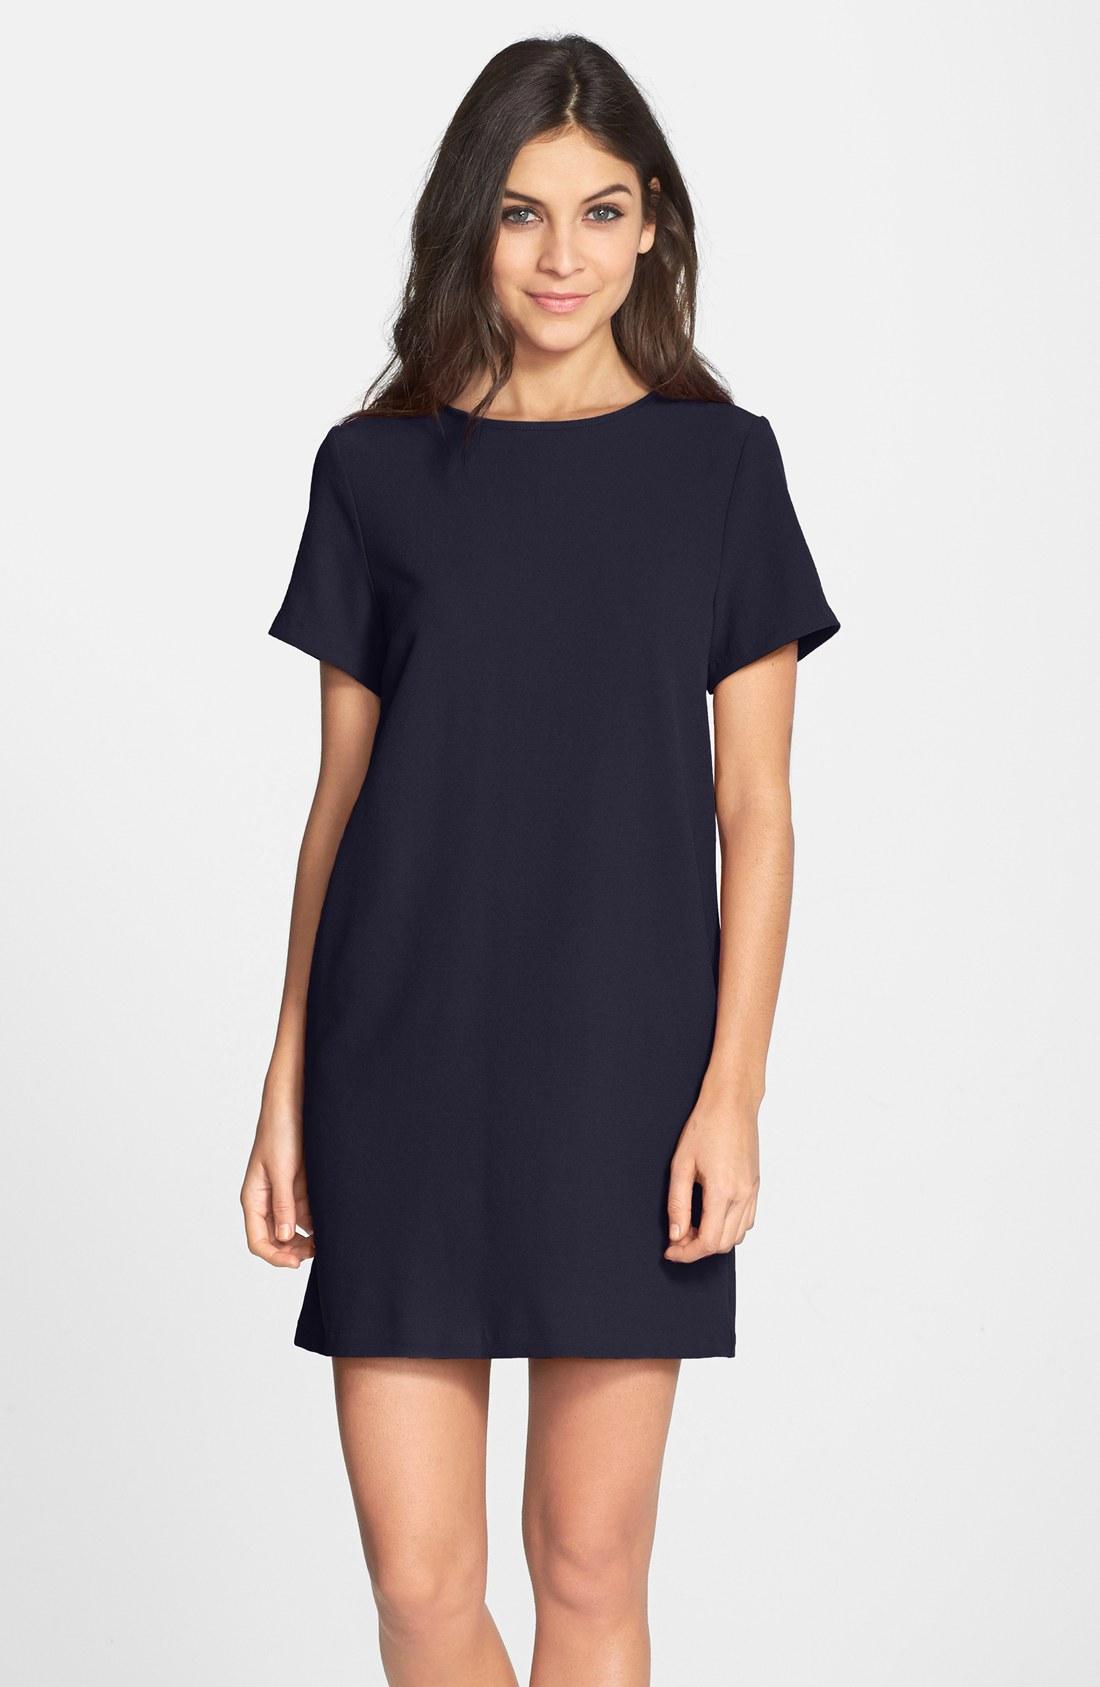 black shift dress womenu0027s black shift dresses | nordstrom VFTMIGA